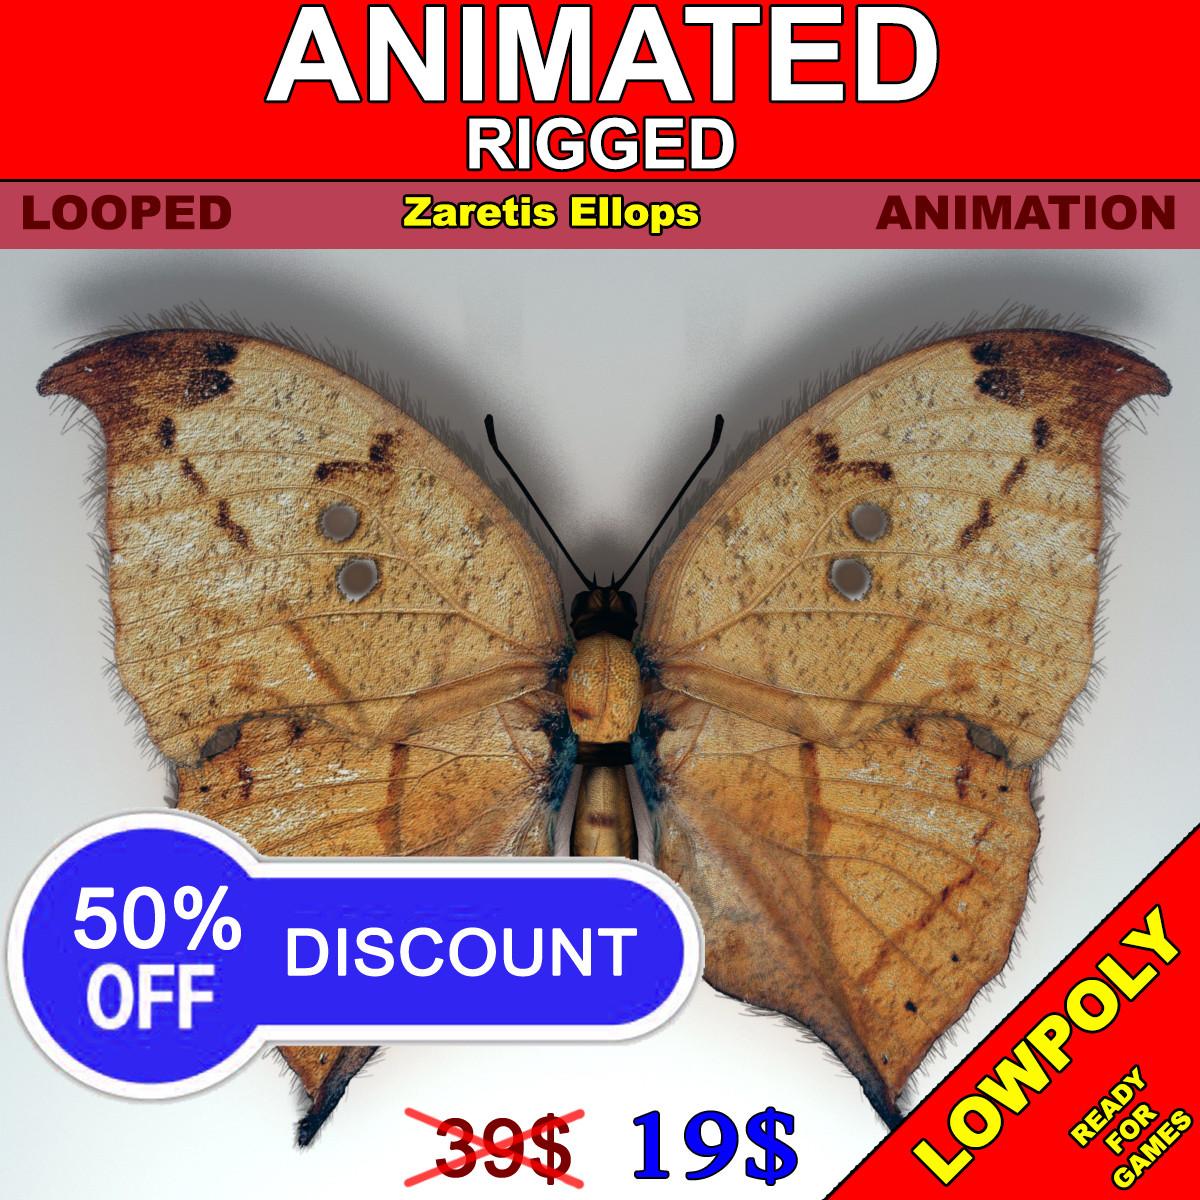 ZaretisEllops_Oblojka_Discount(TurboSquid).jpg